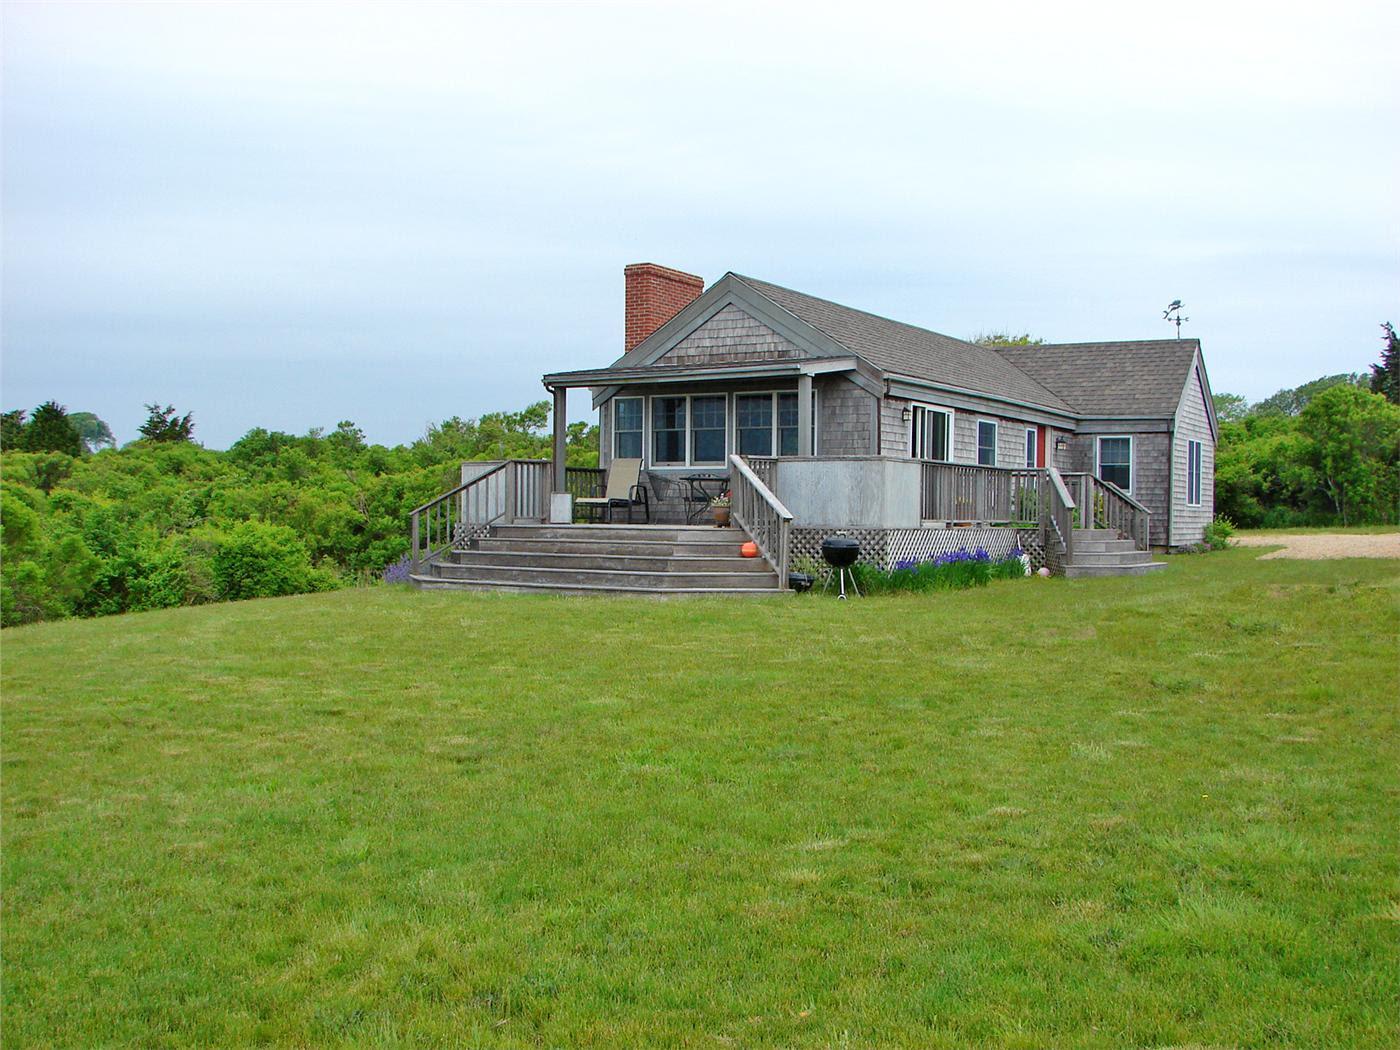 Chilmark Vacation Rental home in Marthas Vineyard MA